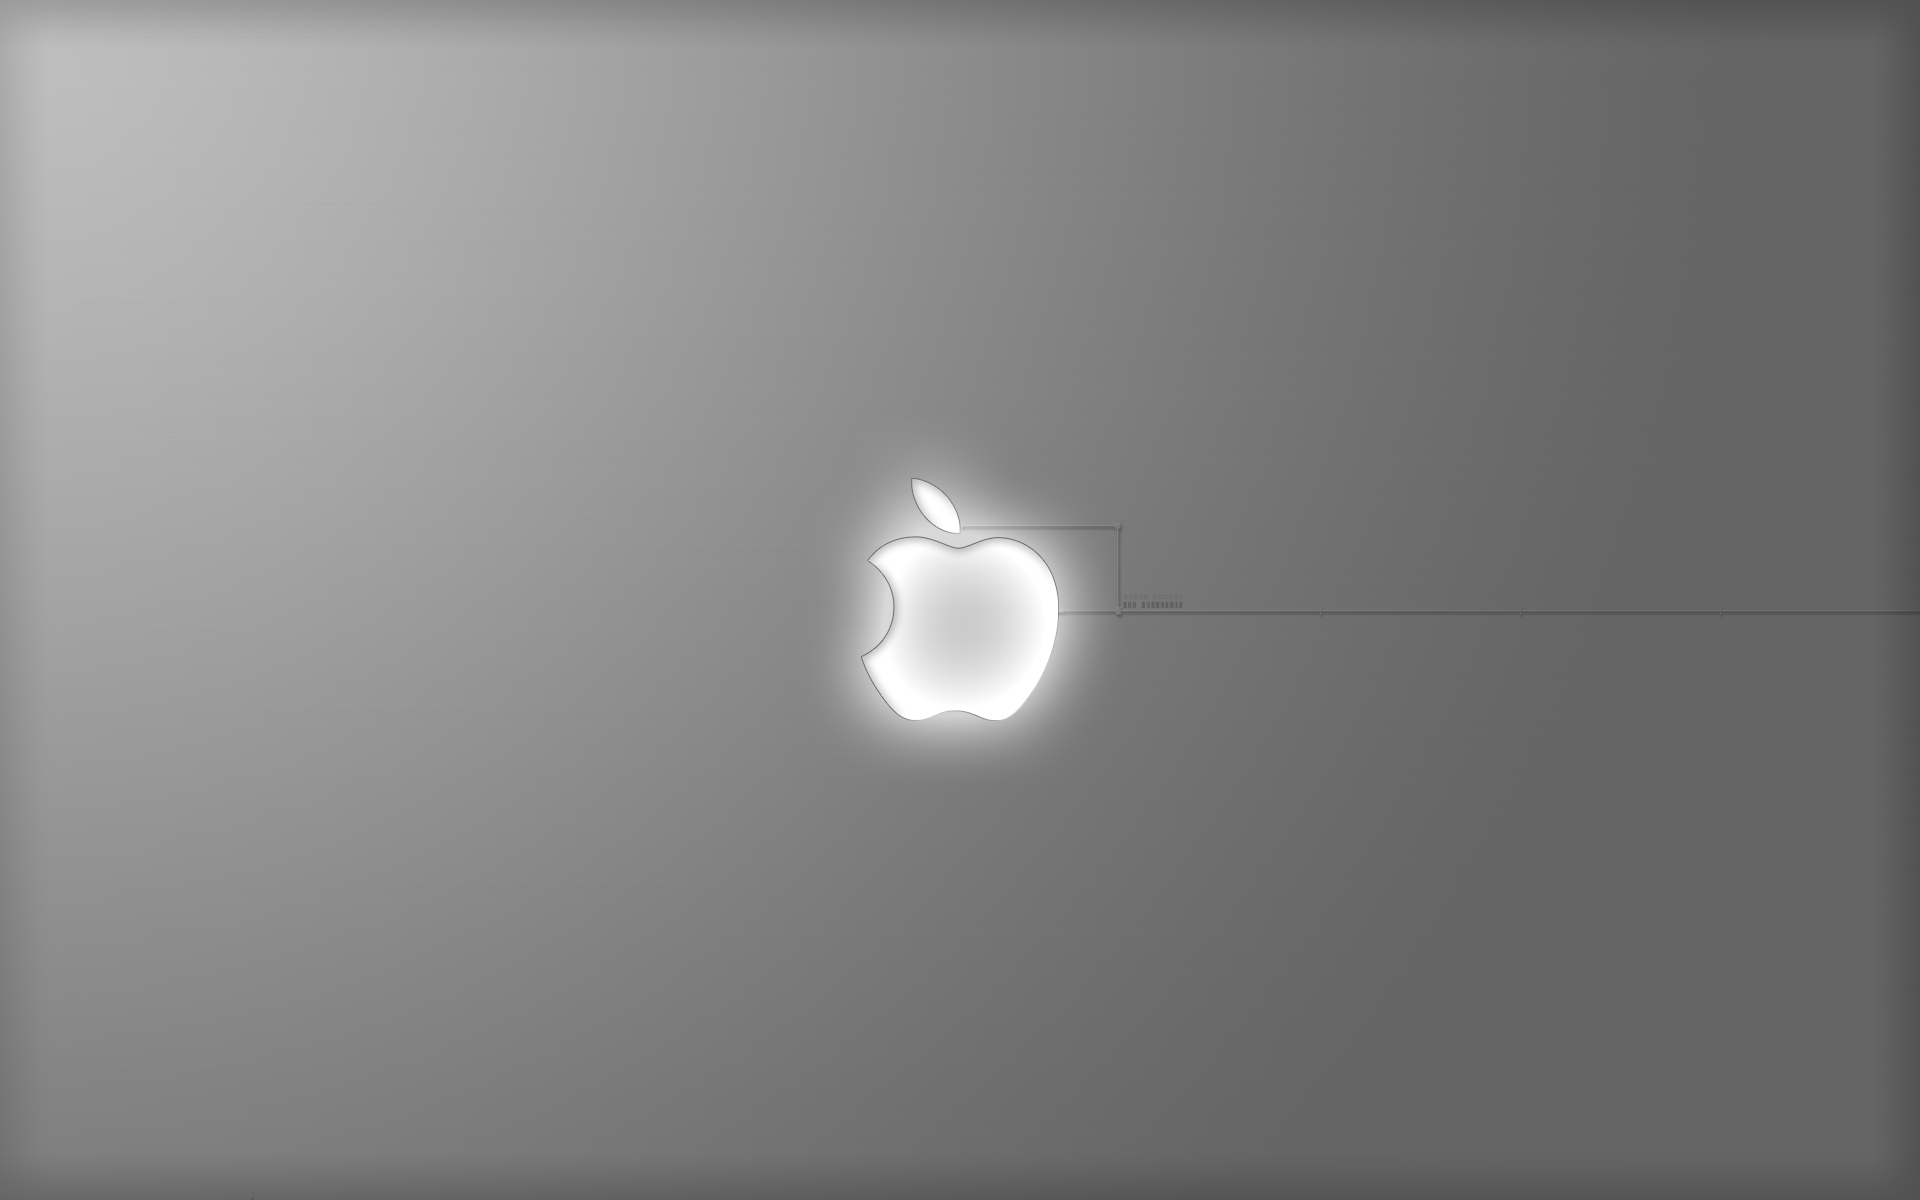 Macbook Pro Hd Wallpaper Backgrounds 1 1920x1200